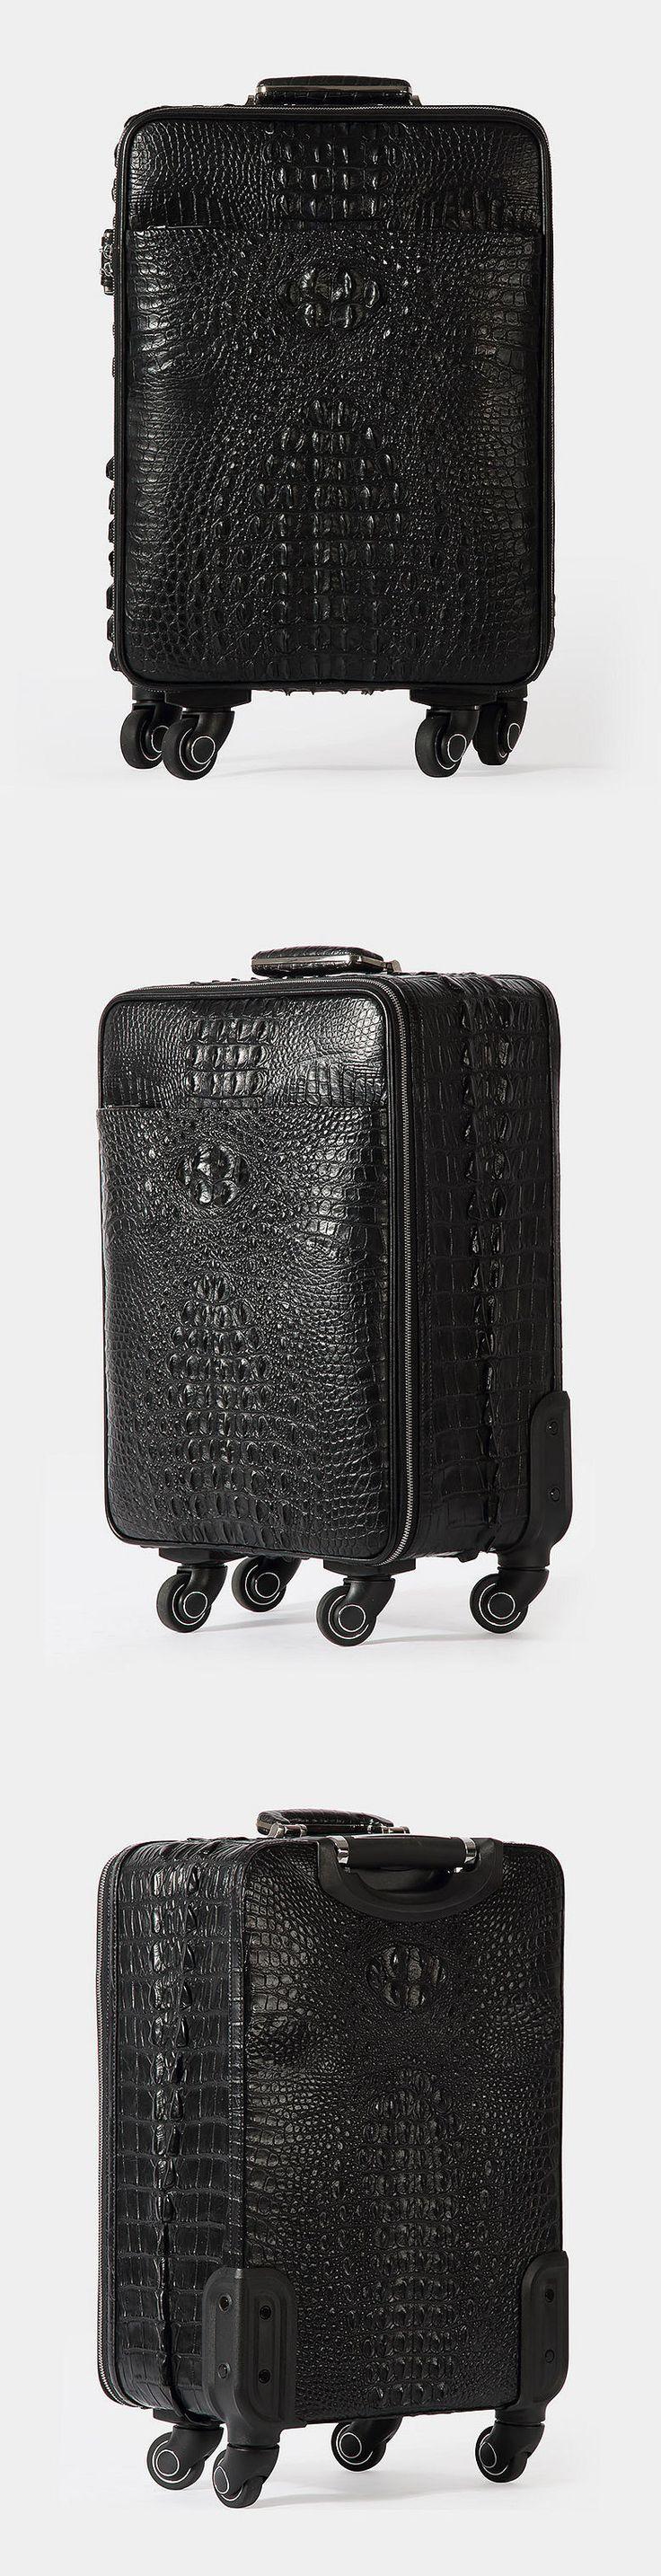 Crocodile Leather Luggage Bag Business Trolley Briefcase Travel Bag